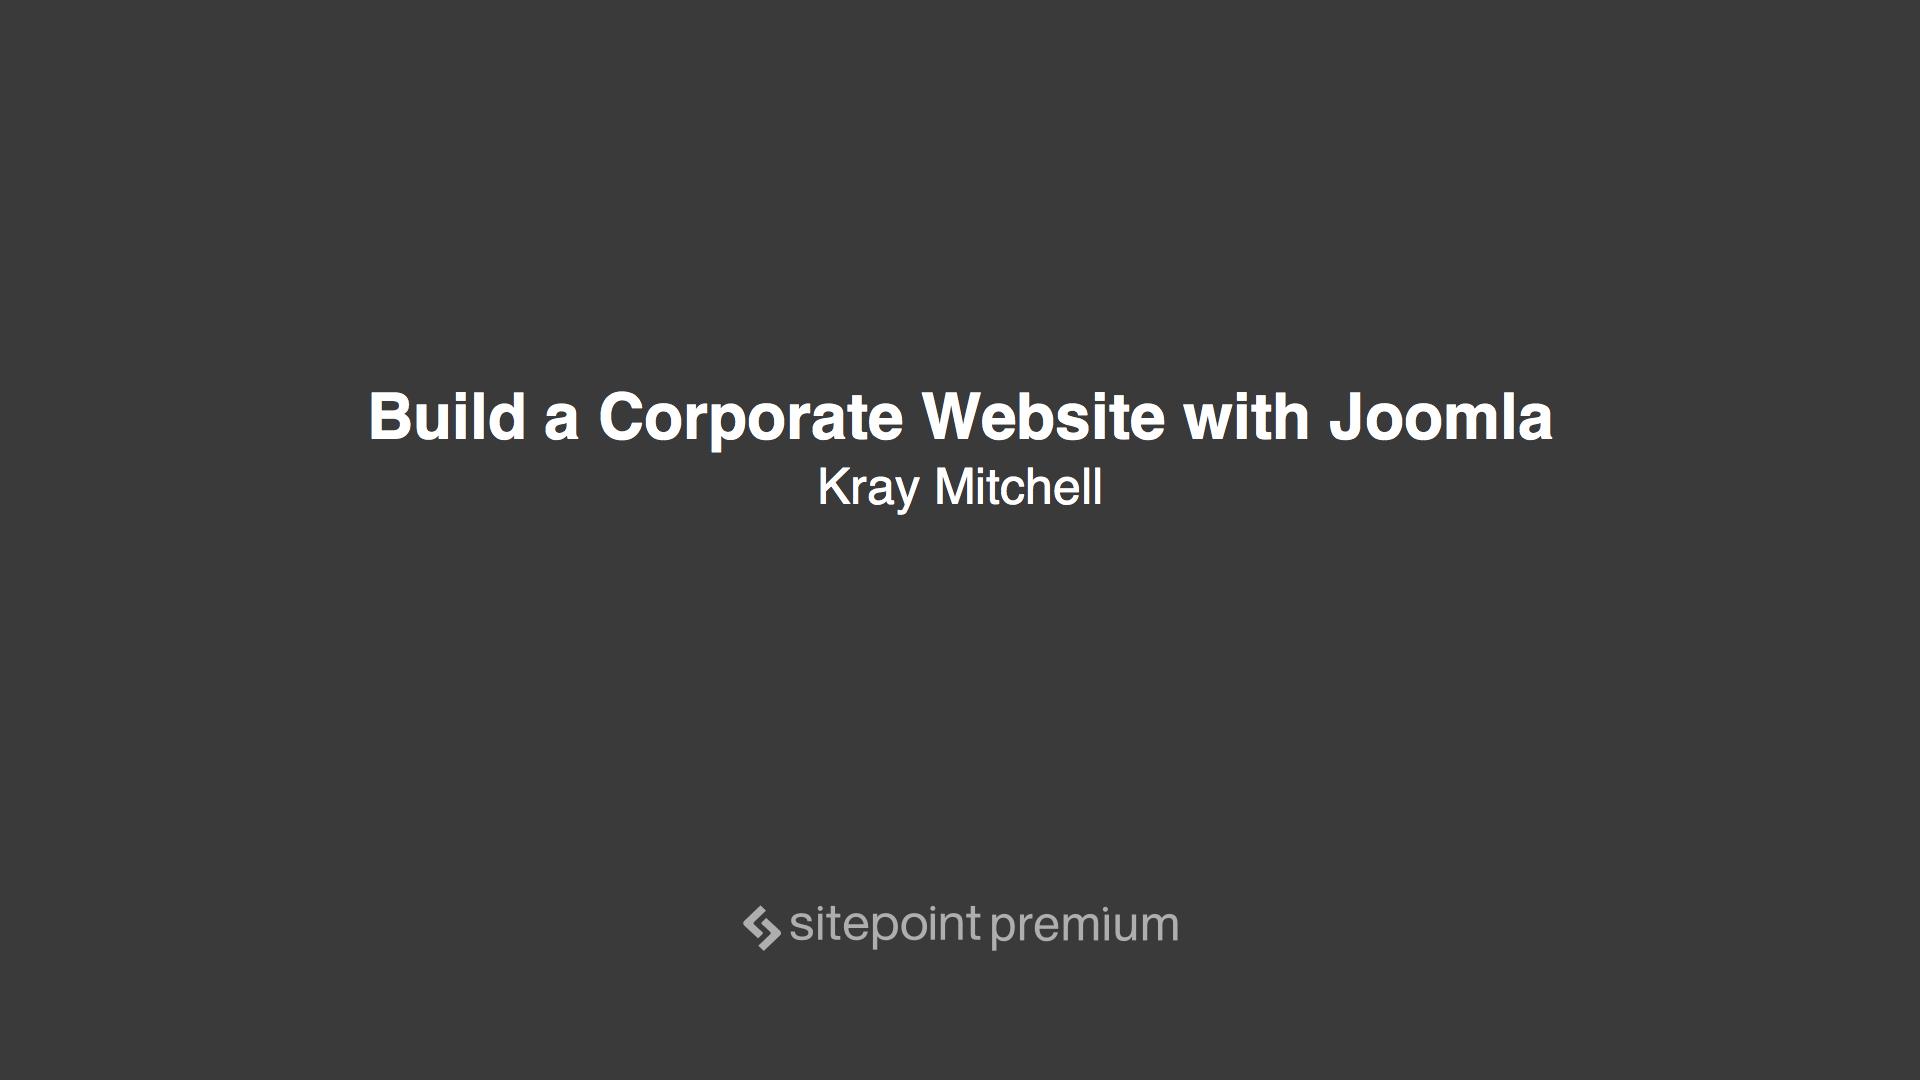 build a corporate website joomla sitepoint premium